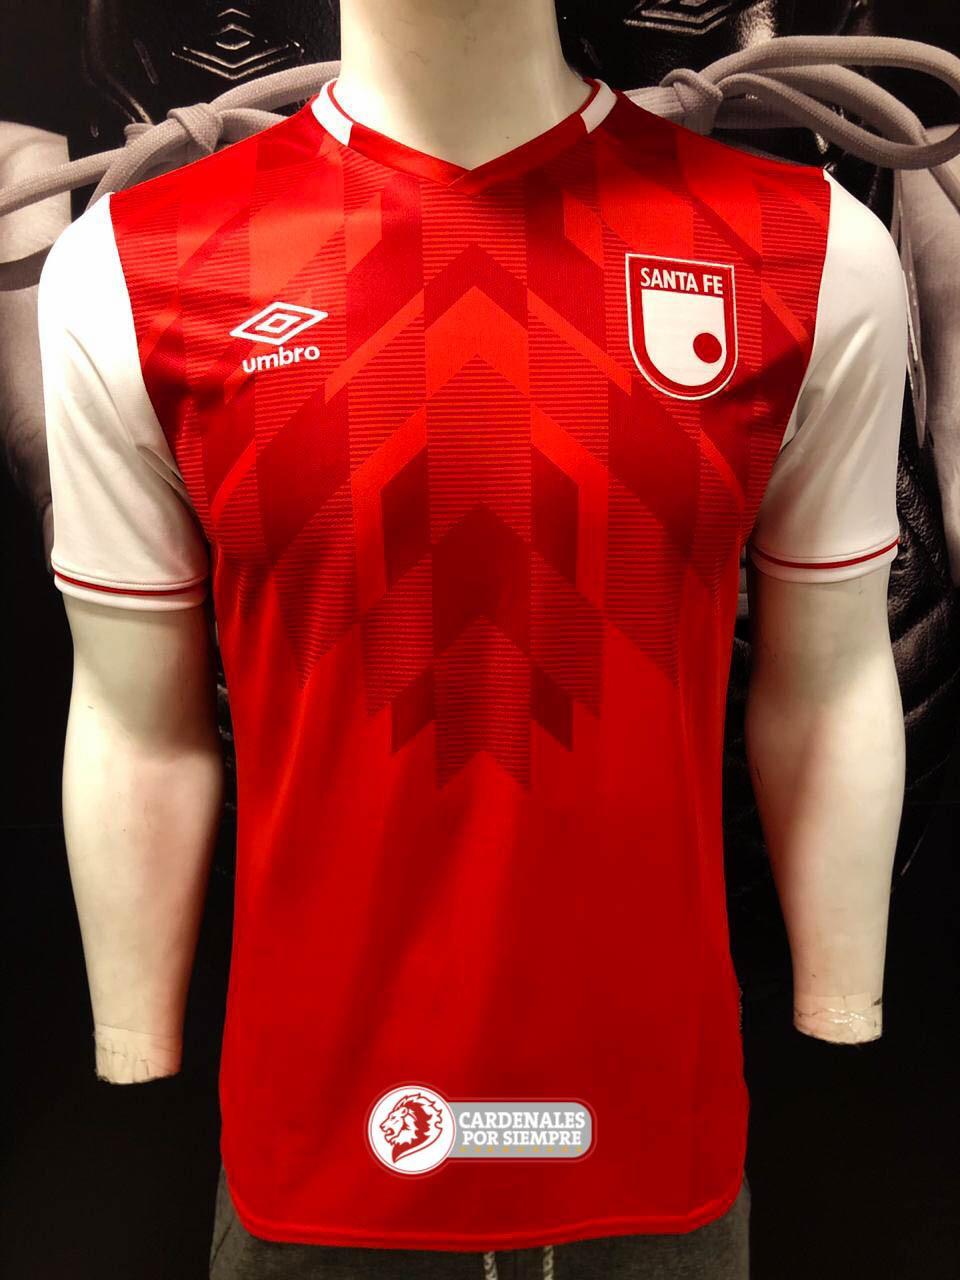 Camiseta Santa Fe - Umbro 2020 - Roja